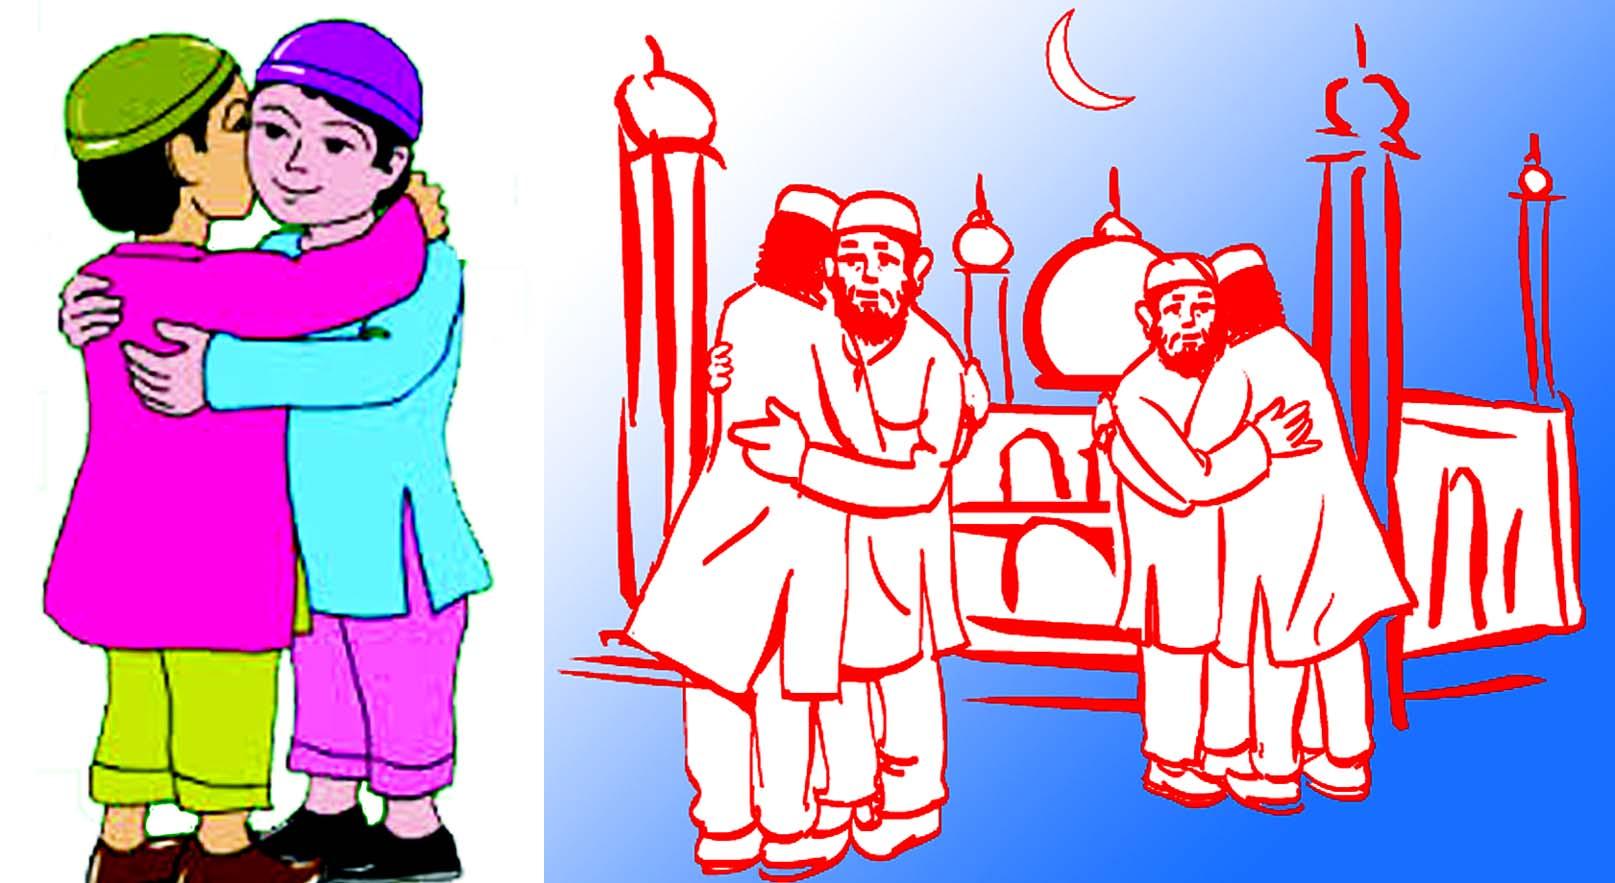 Celebration clipart eid al fitr Celebration Fitr ul celebration Eid